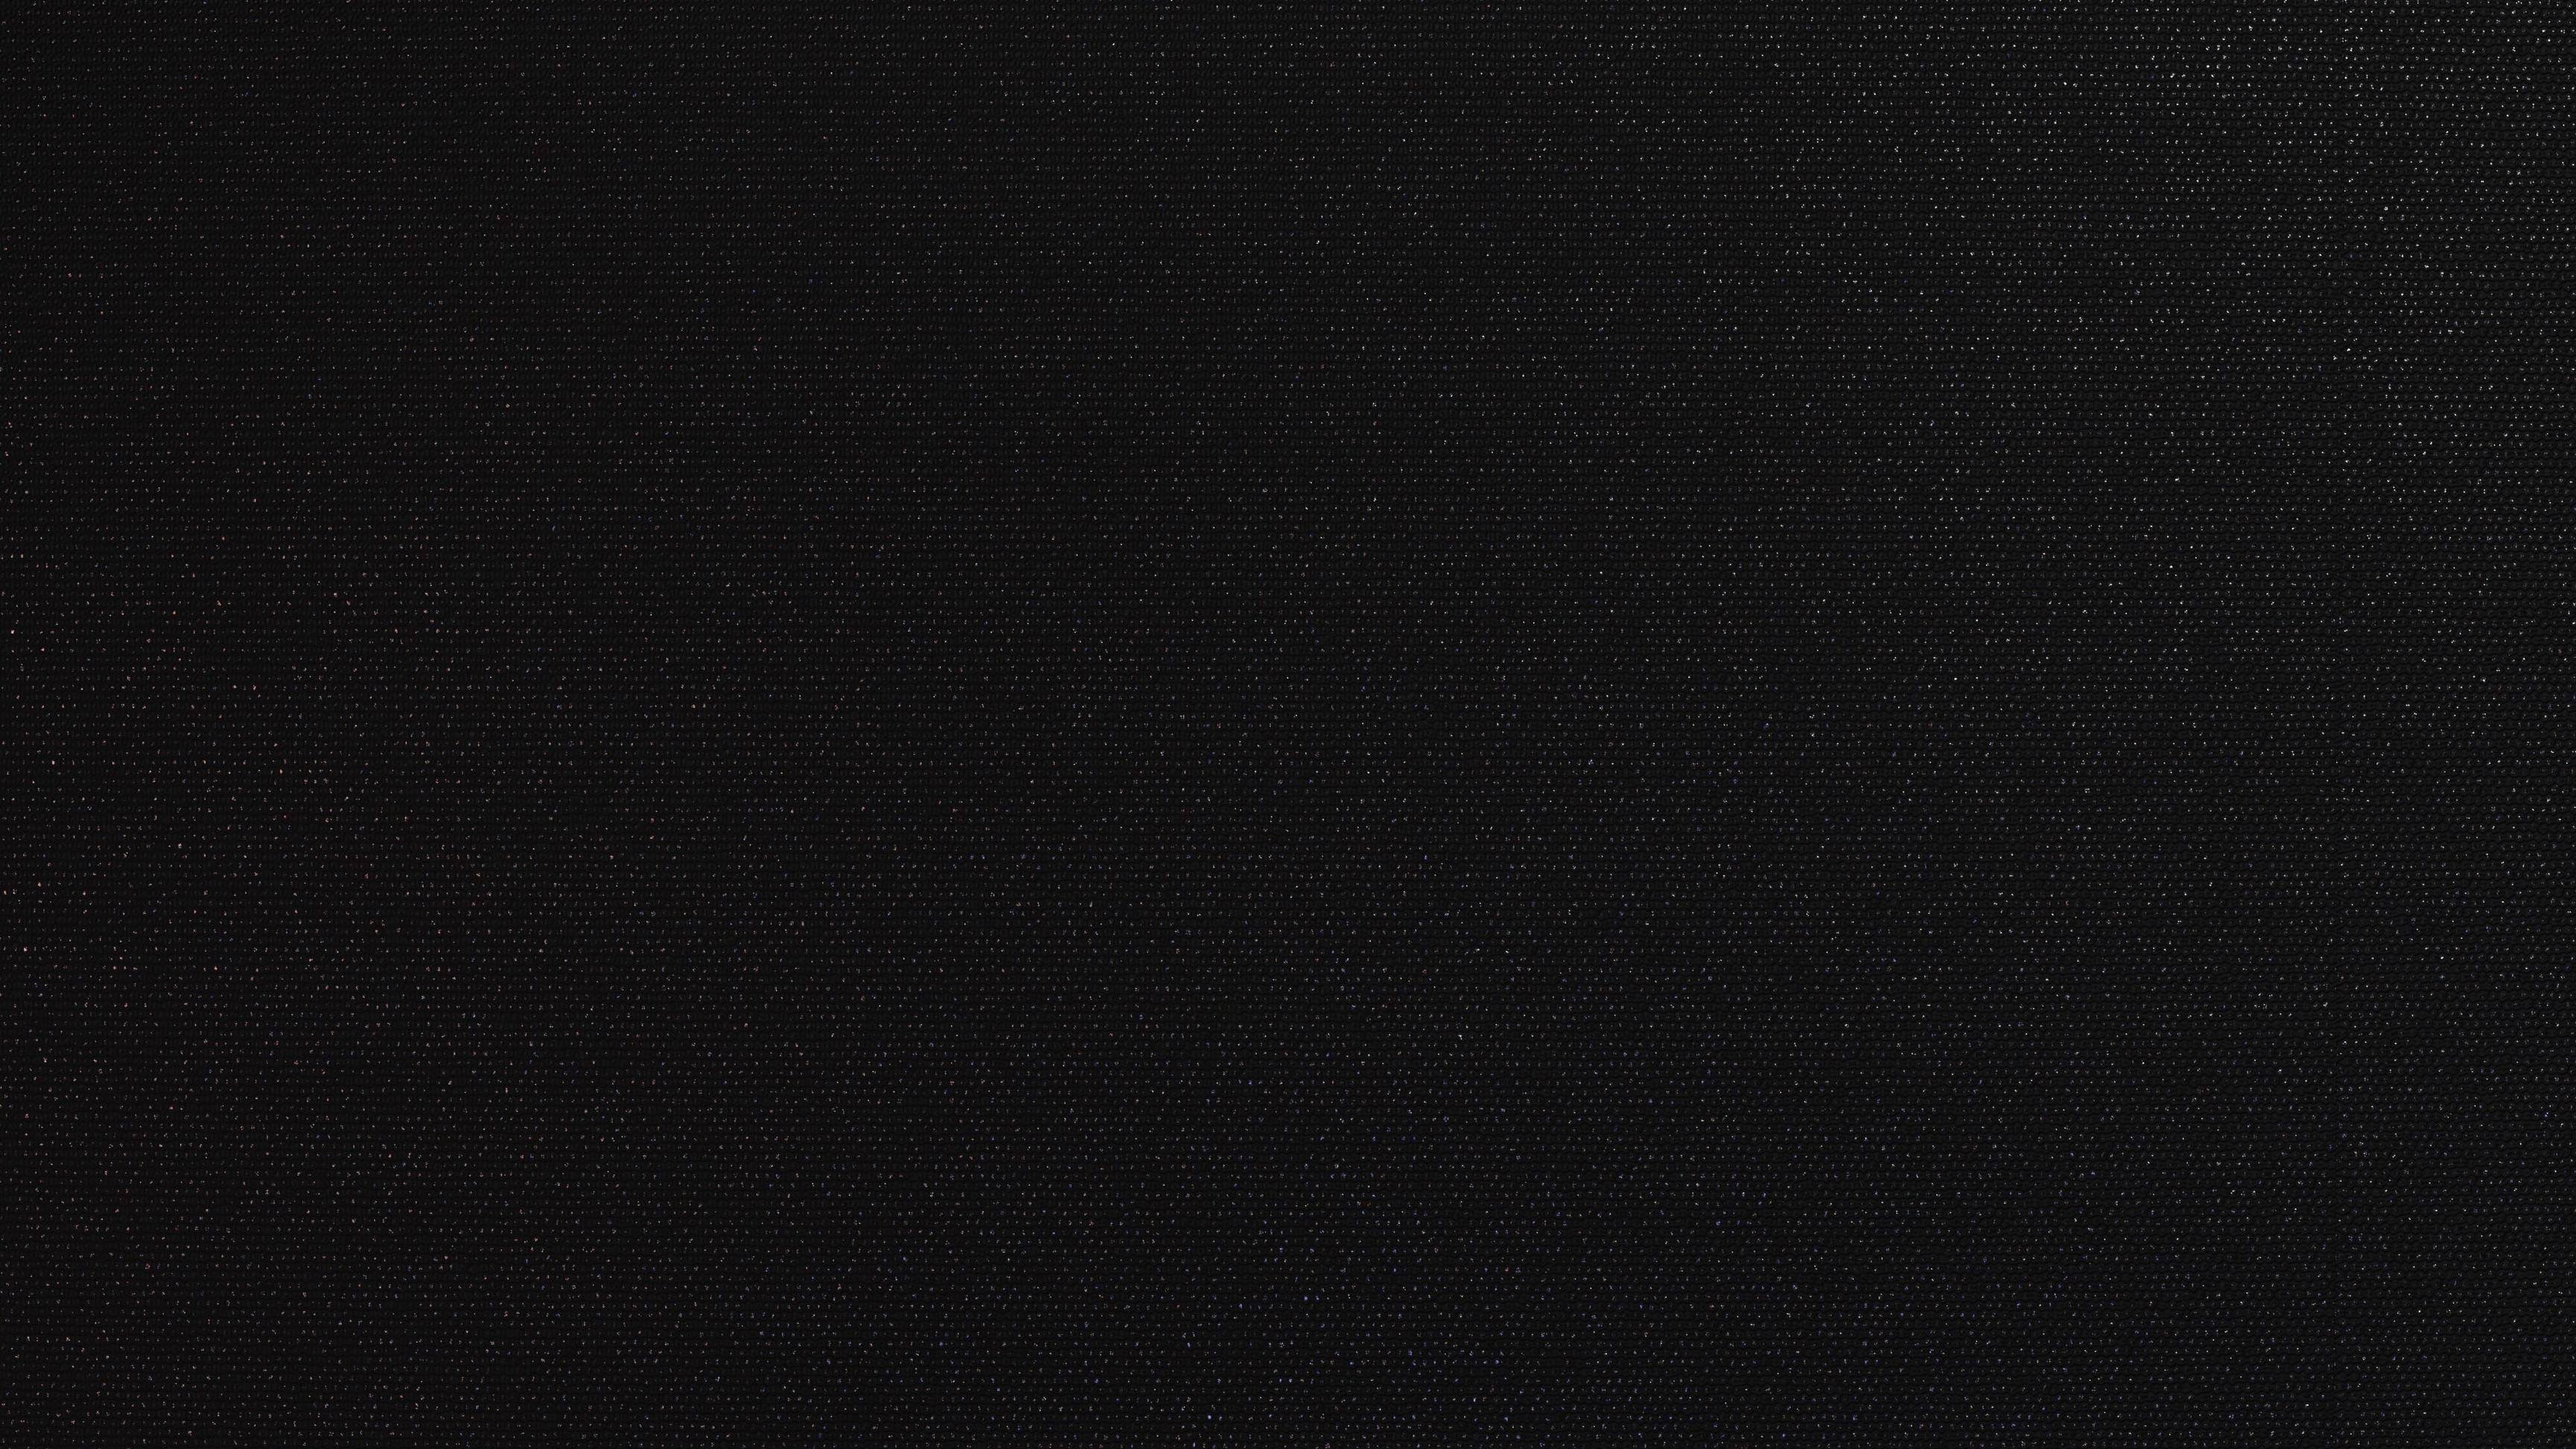 full black wallpaper - HD3456×1944